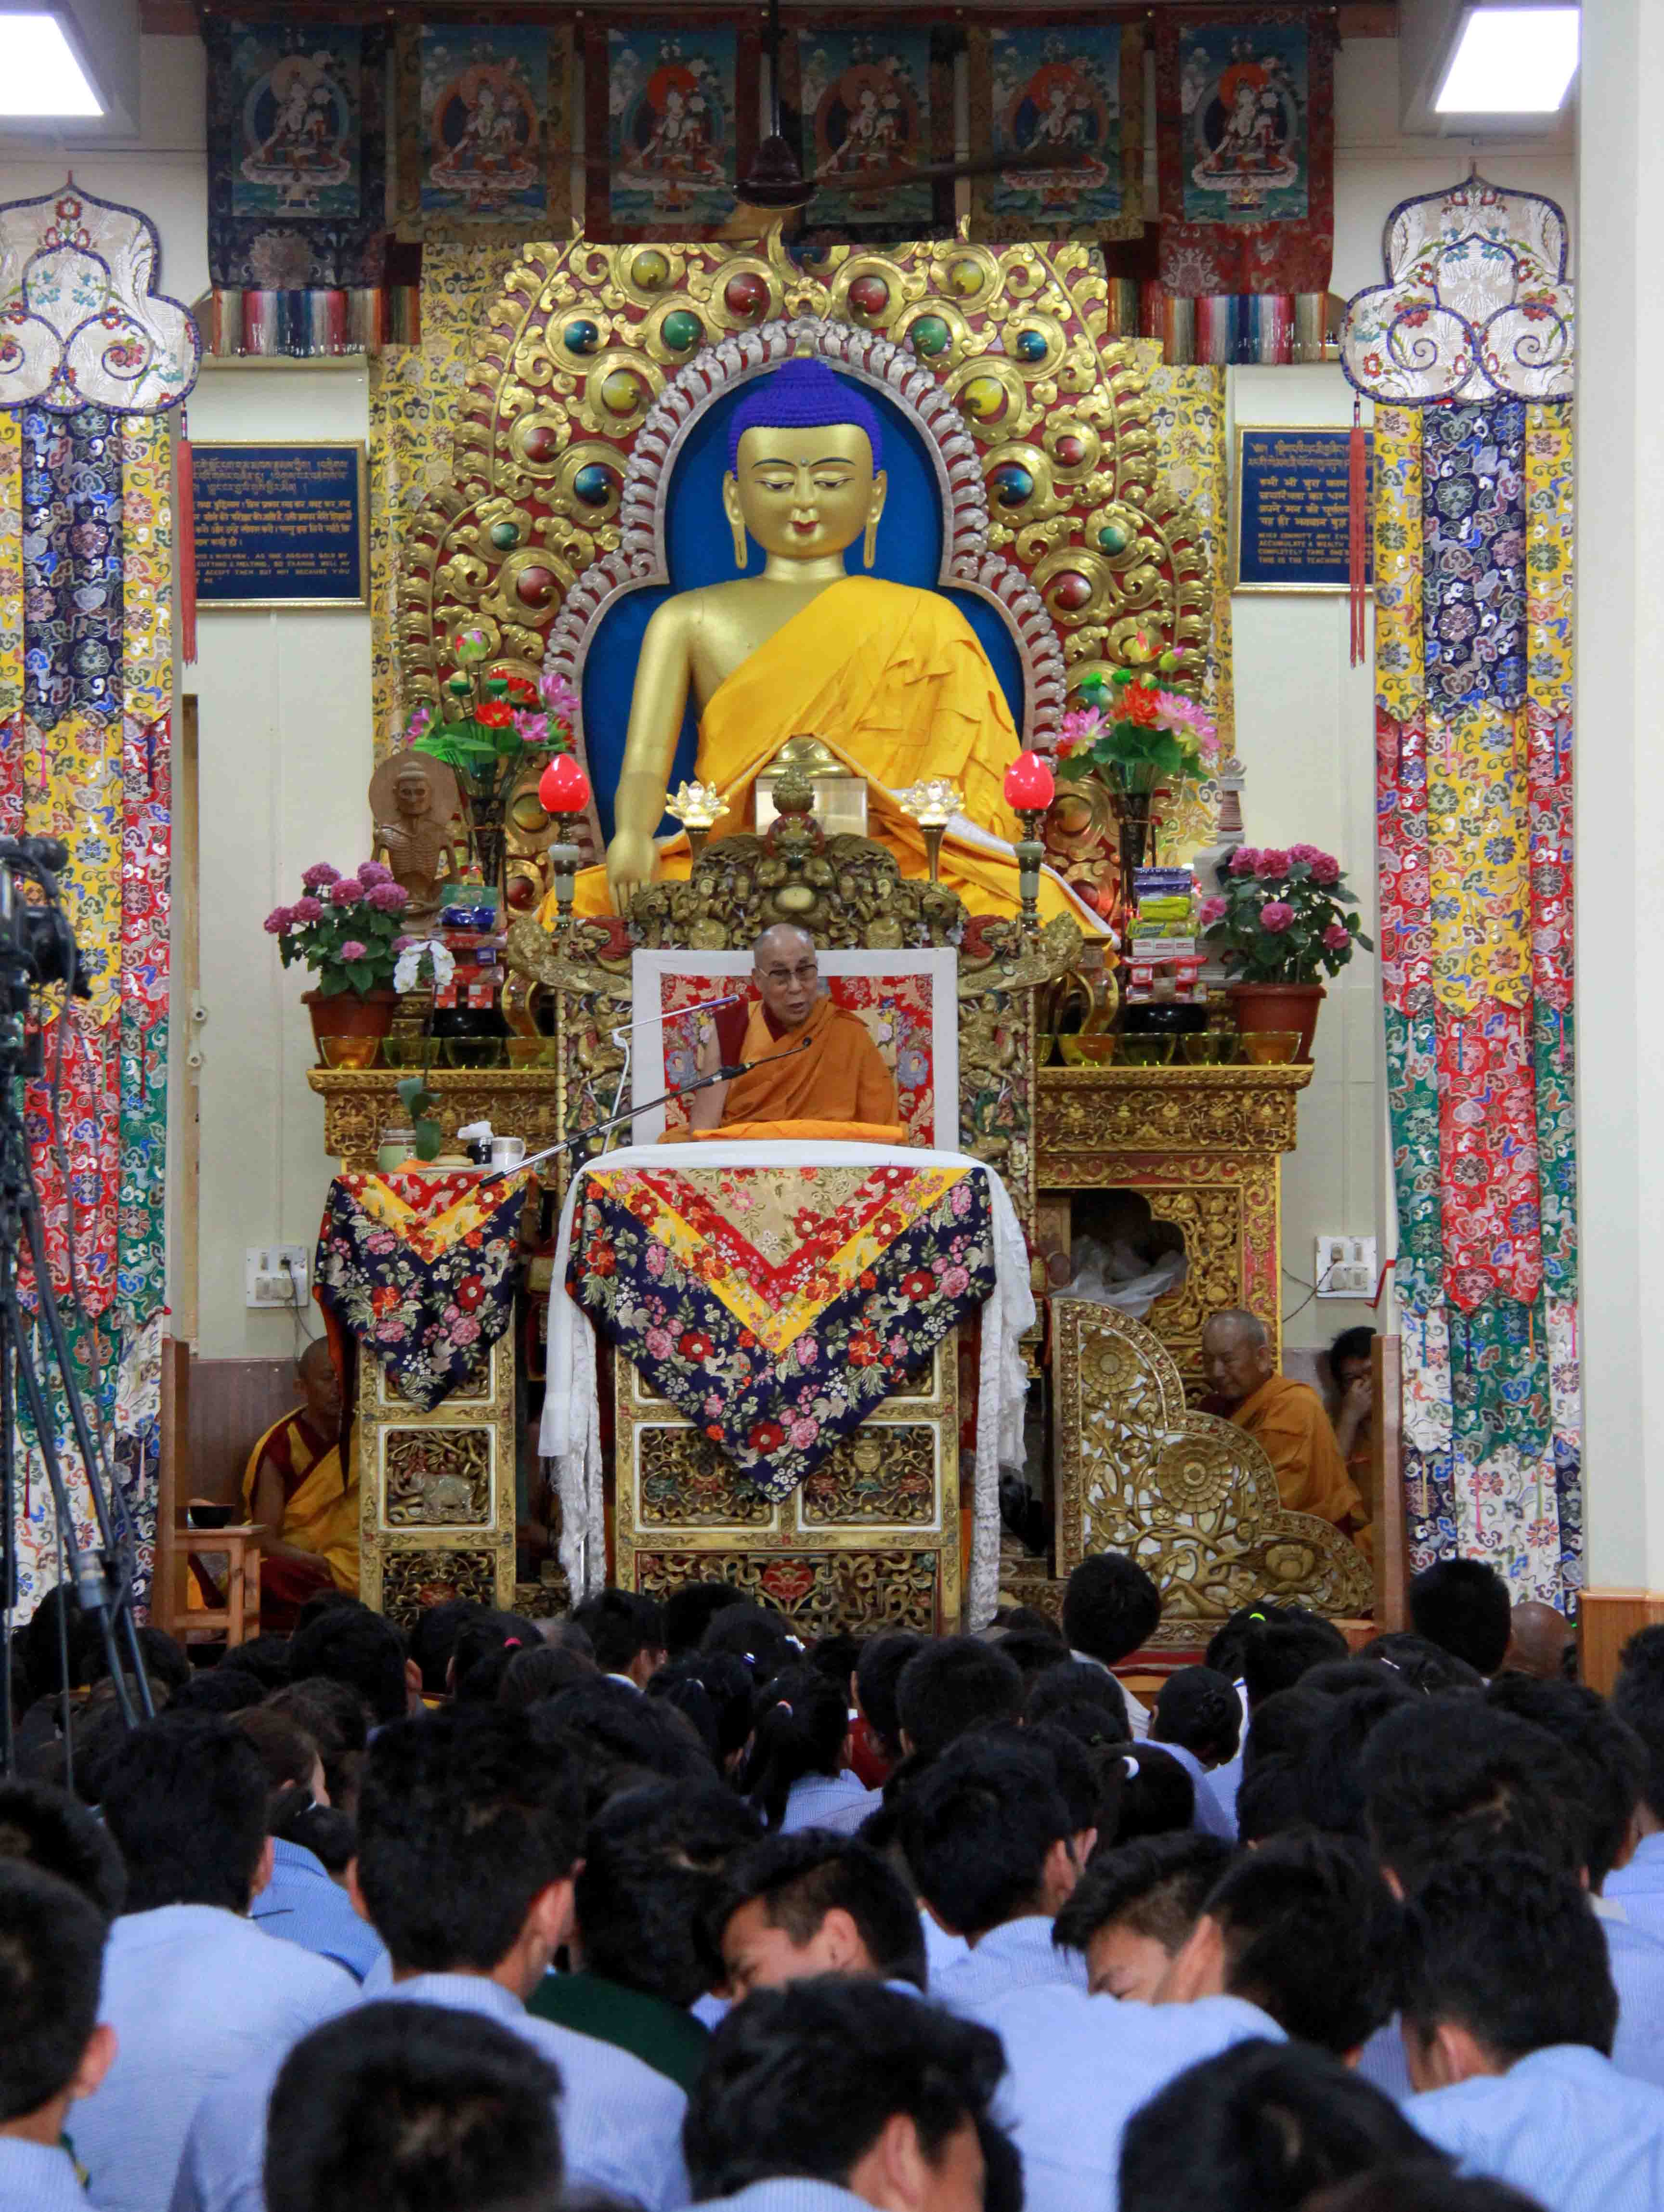 The Dalai Lama explaining the text of 'Tree of Faith - a Self-Exhortation' to the Tibetan youths. (Photo courtesy: Norbu Jinpa/Tibetan Review)